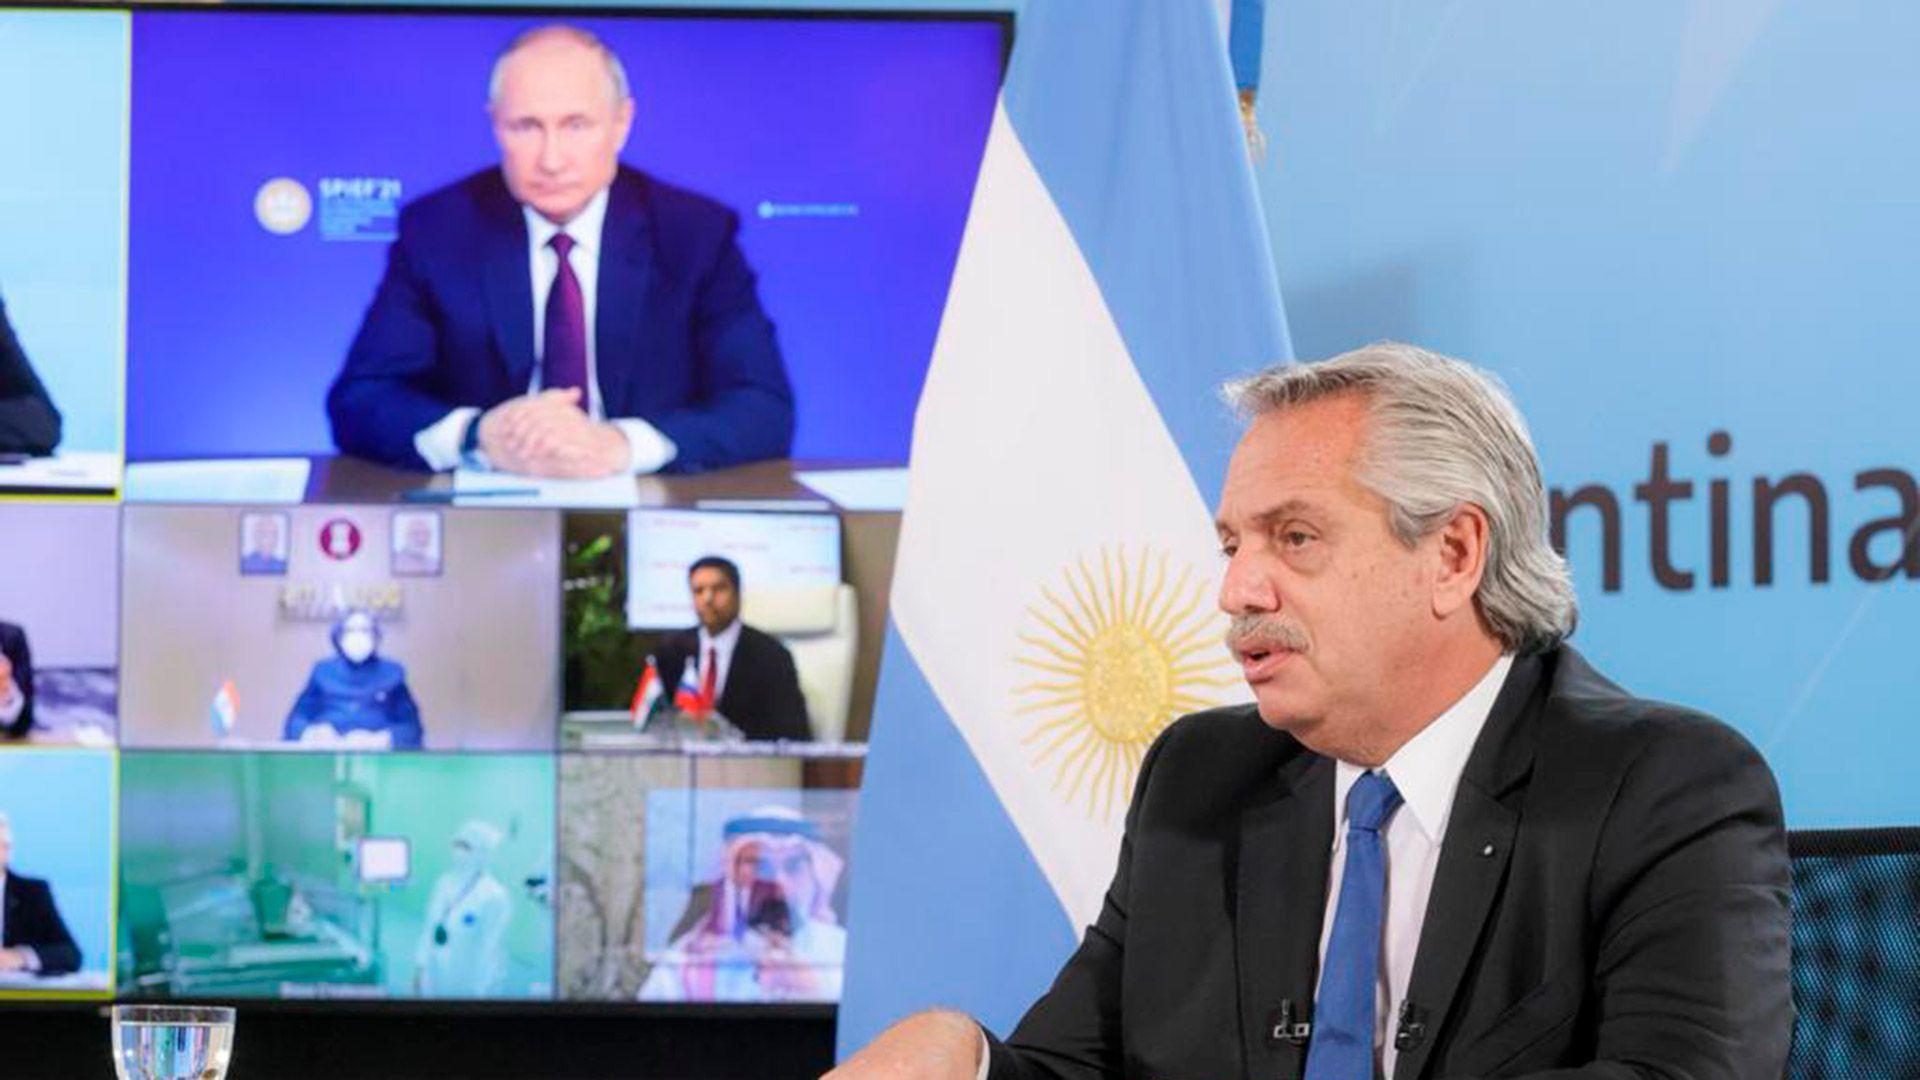 alberto fernandez vladimir putin produccion sputnik V argentina figueiras